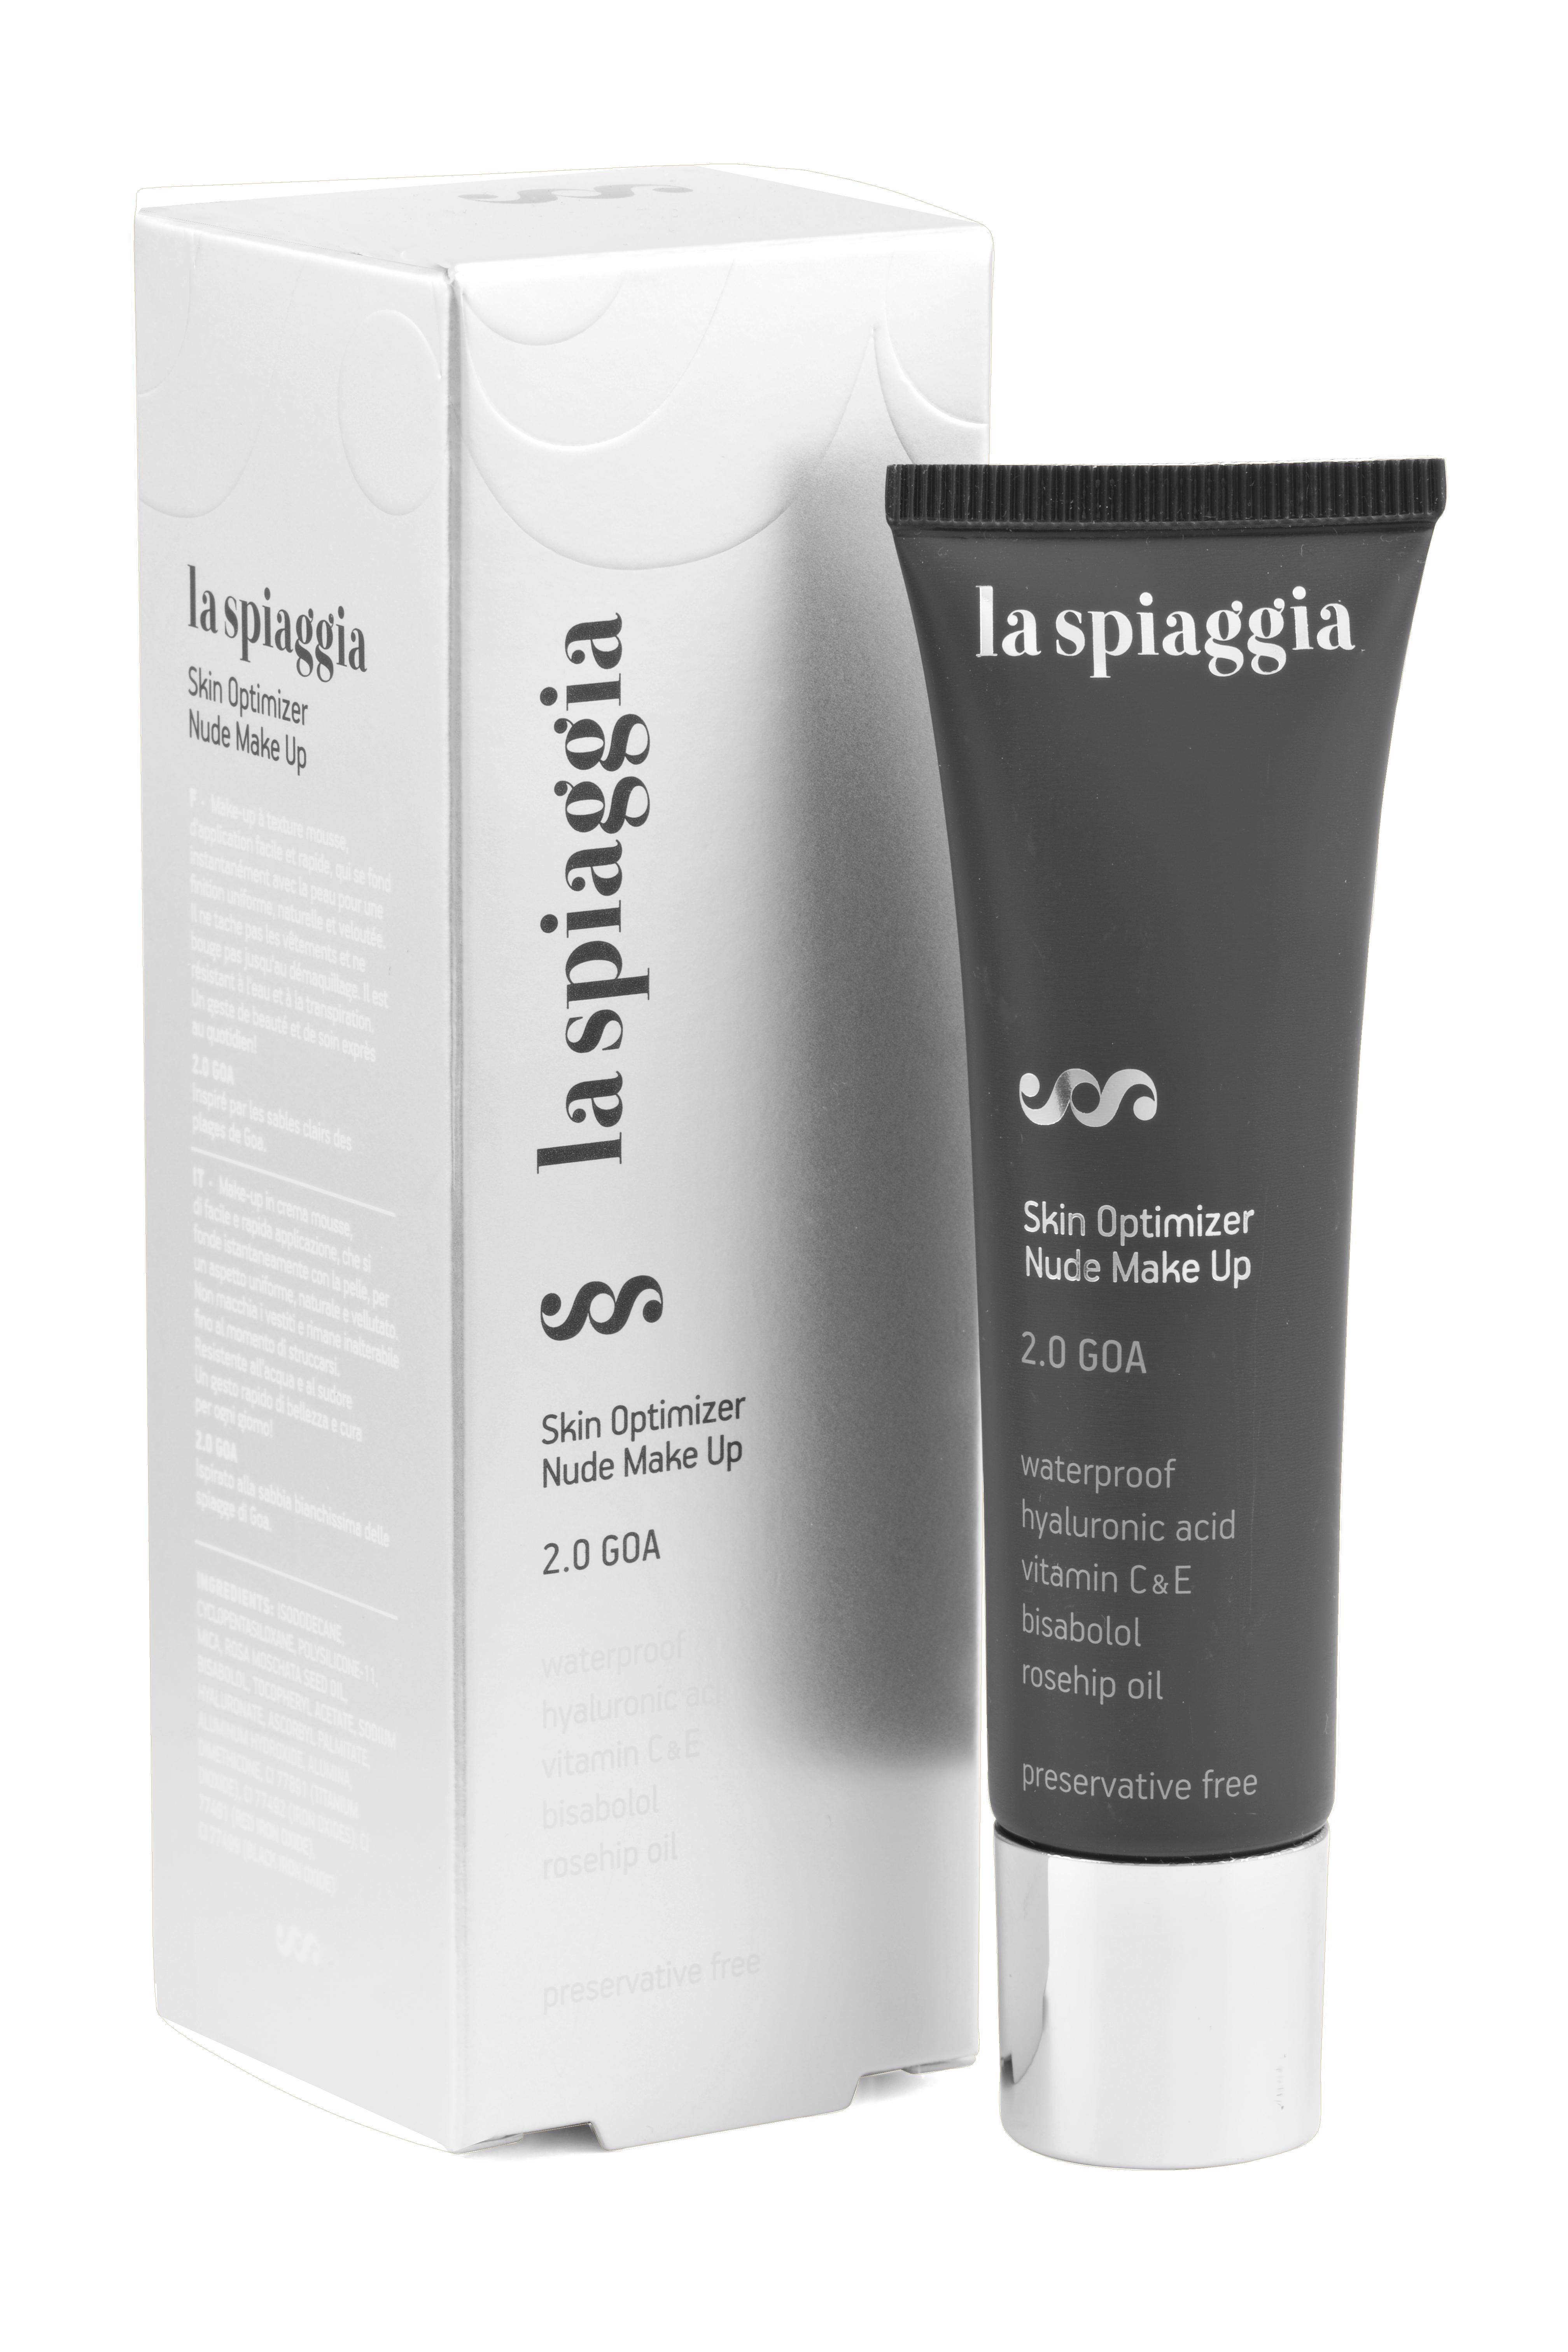 LA SPIAGGA Skin Optimizer Nude Make Up 2.0 GOA